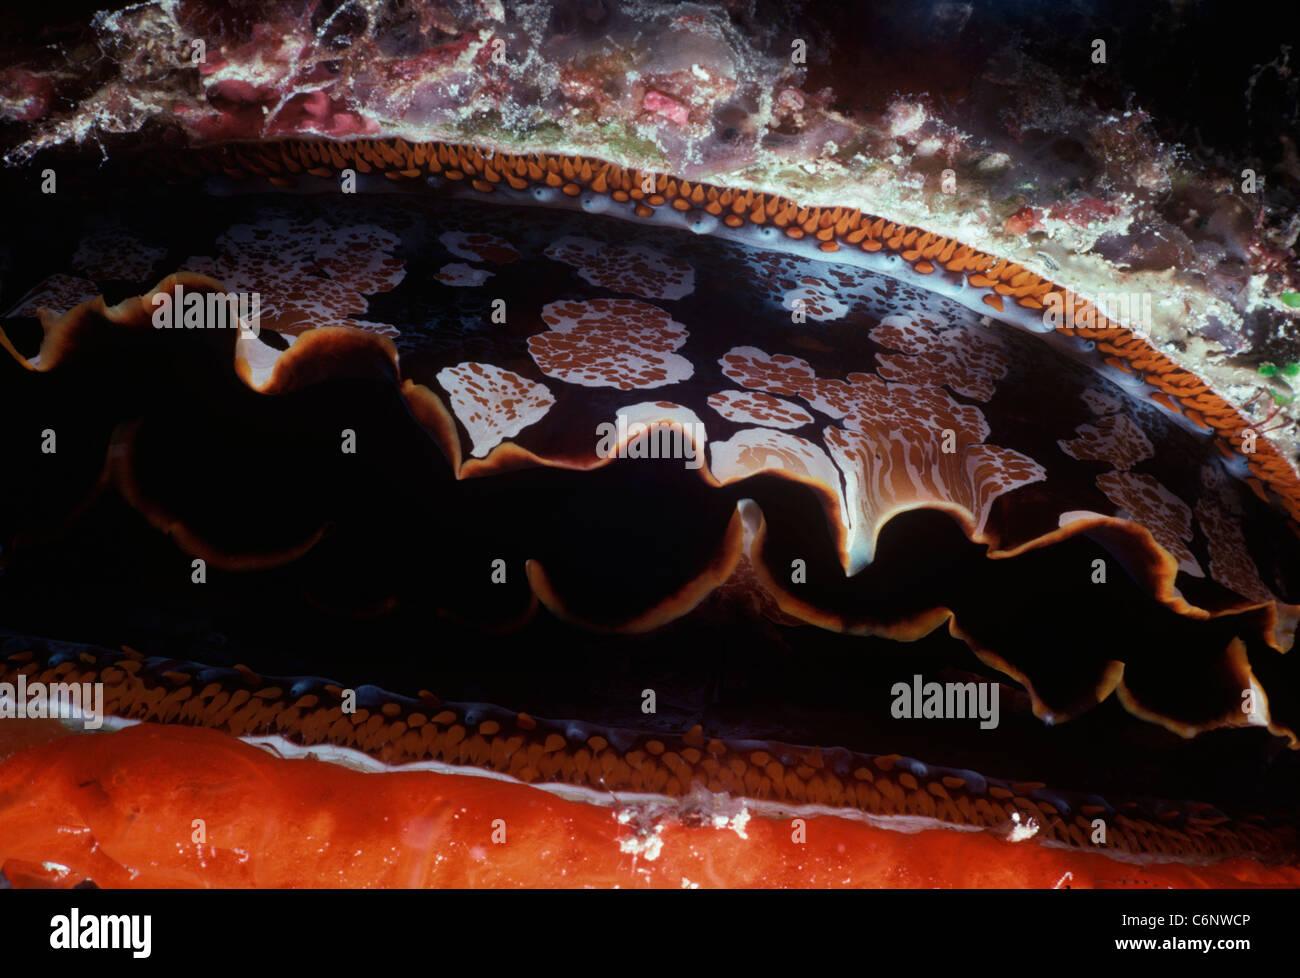 Huître épineuse (Spondylus varius) (les) manteau de nuit. L'île de Sipadan, Bornéo - Mer Photo Stock